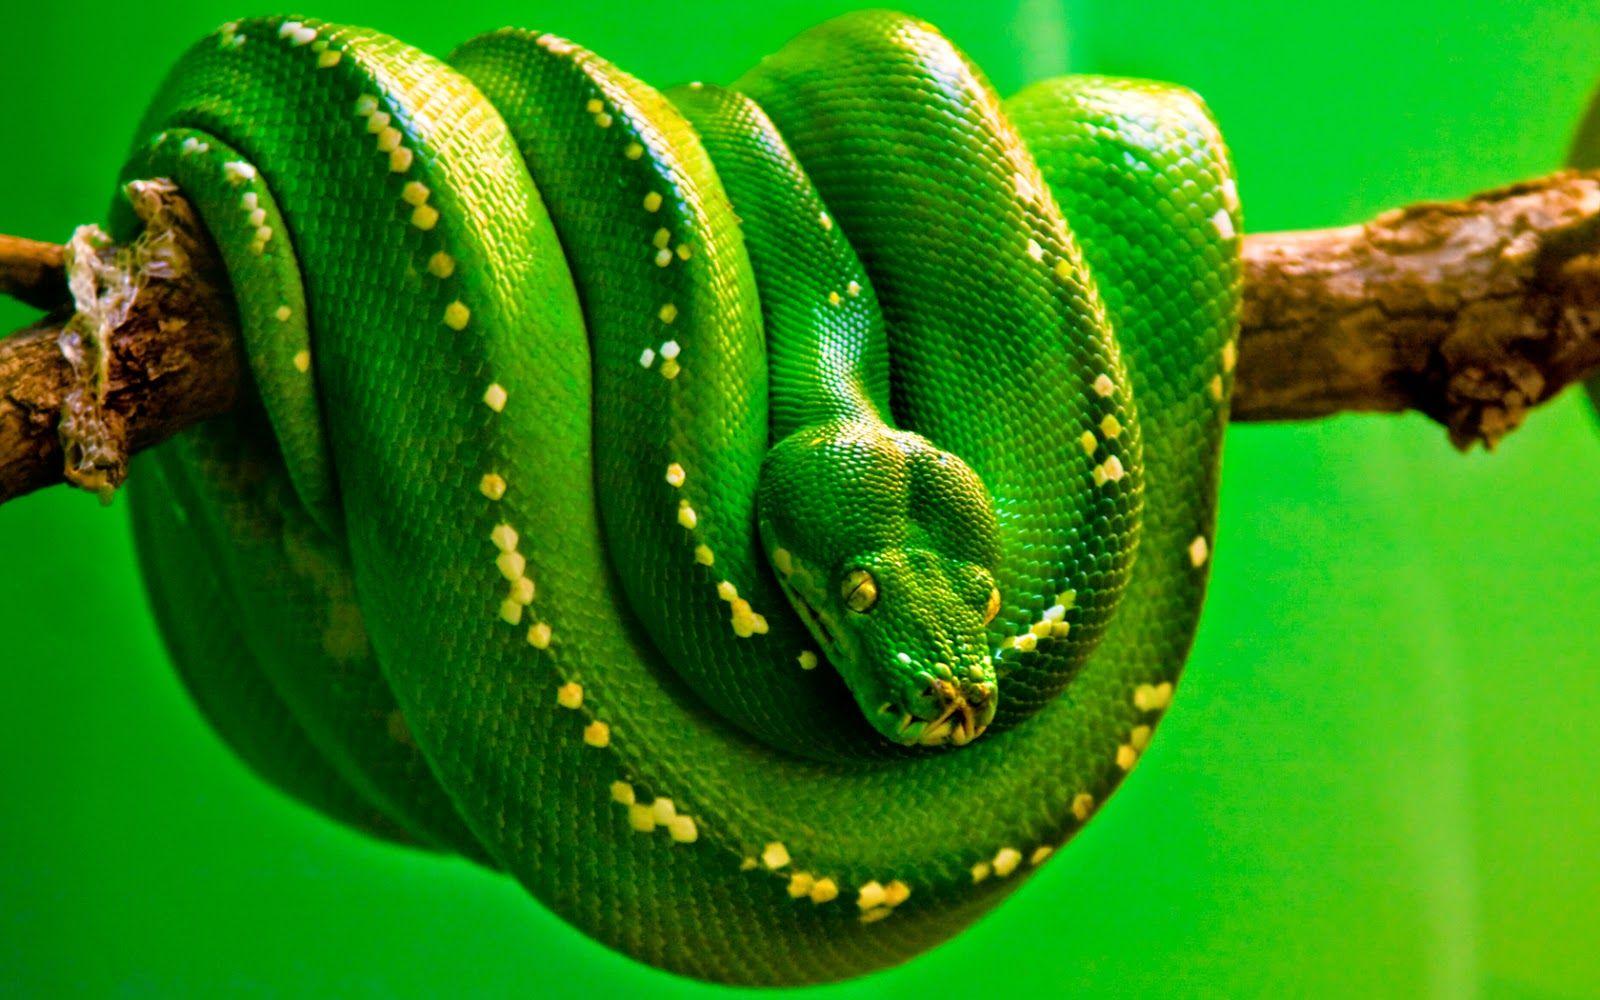 Beautiful snakes hd wallpapers free download desi girls - Hd wilderness wallpapers ...